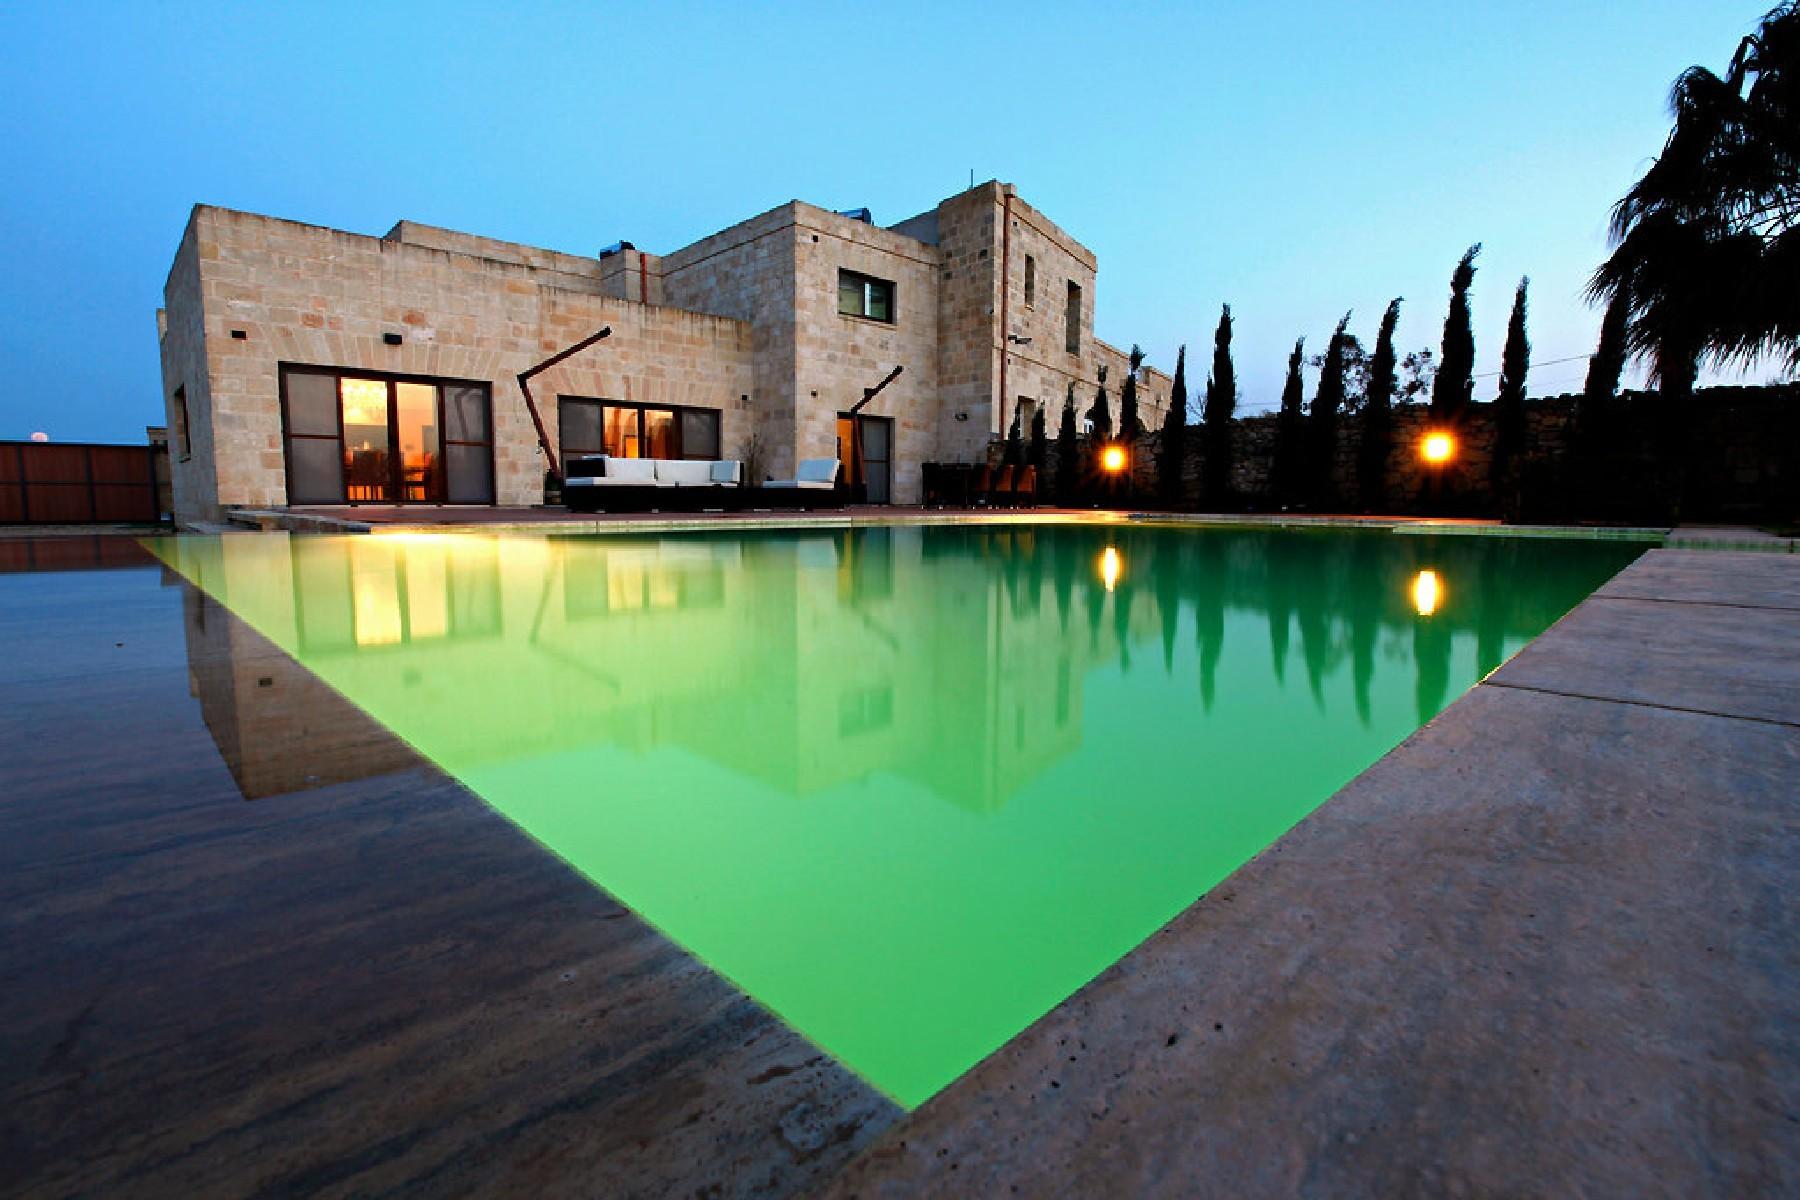 Malta Holiday rentals in Marsascala, Marsascala